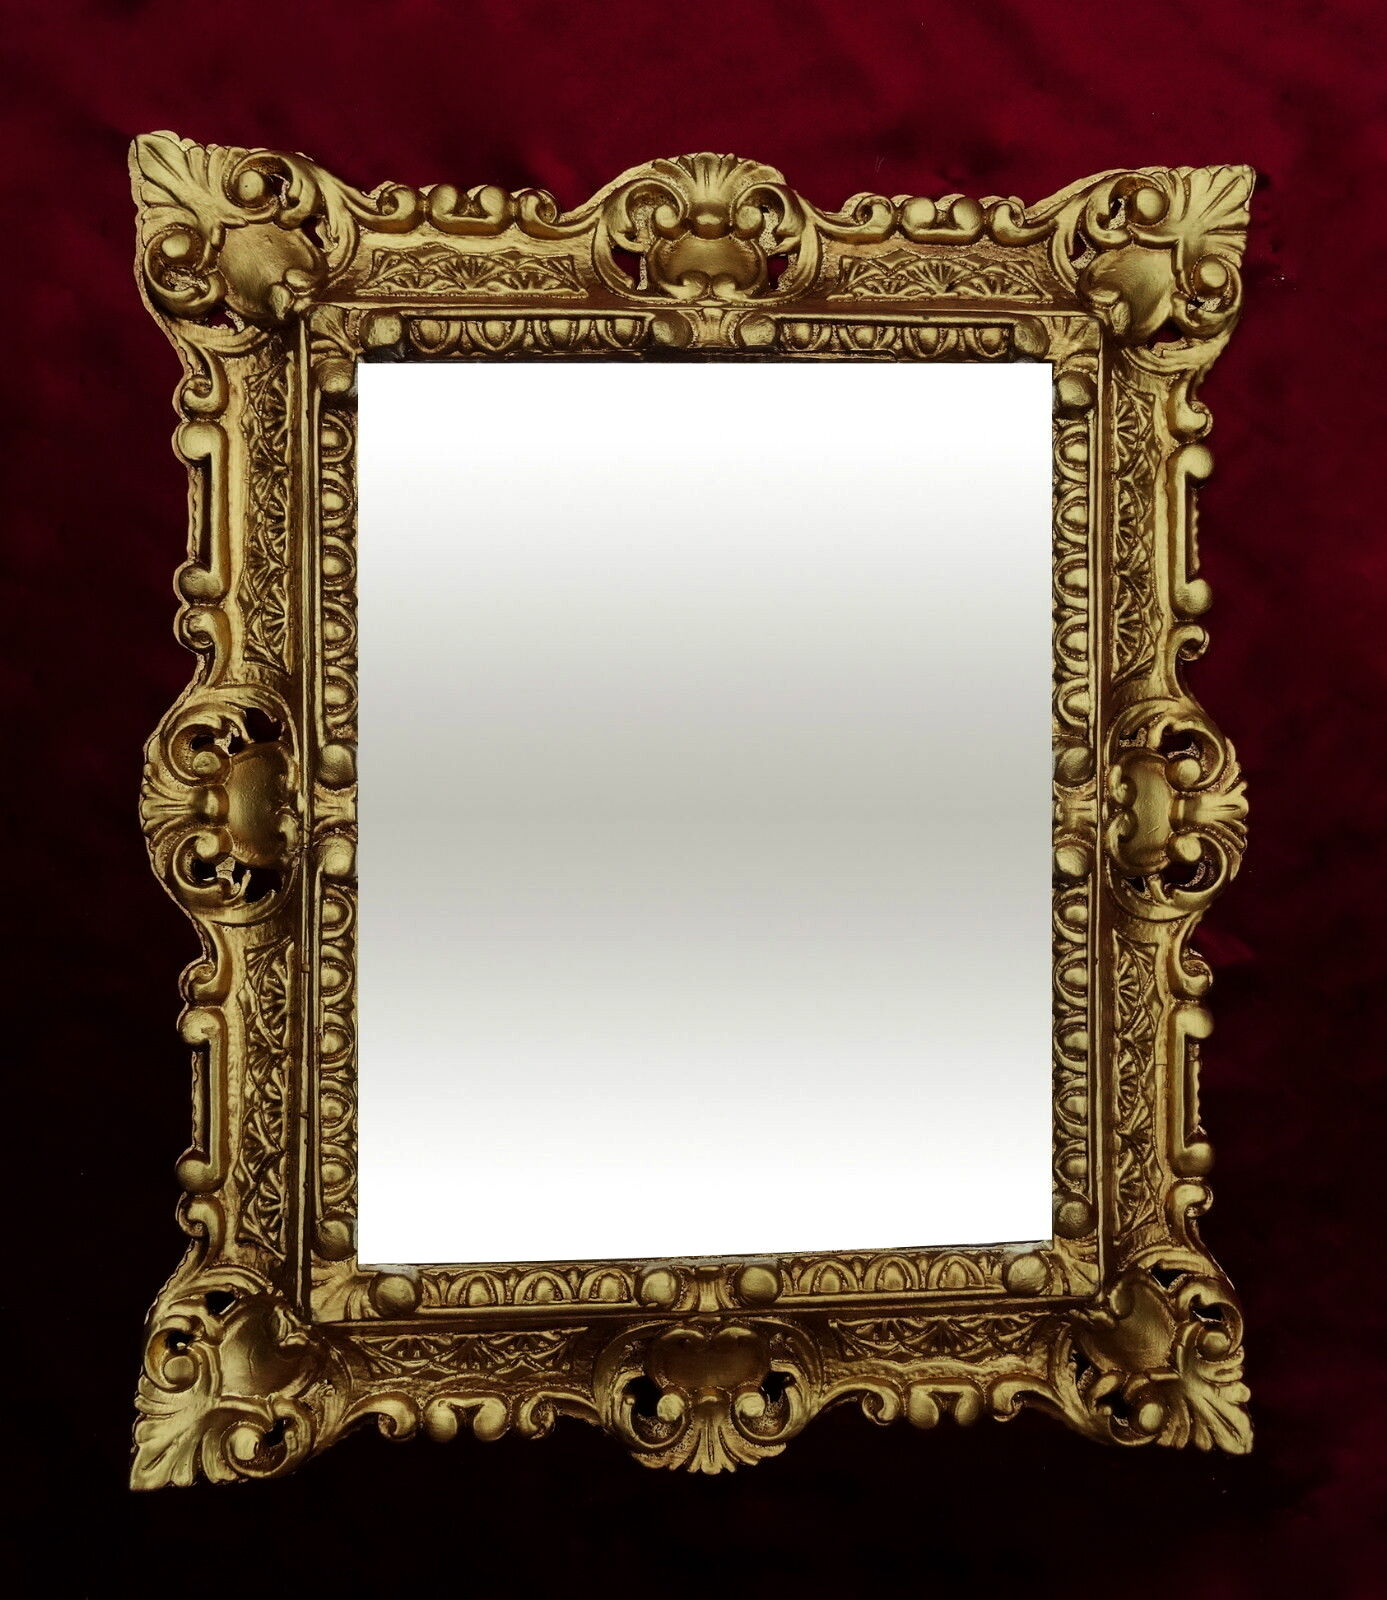 bilderrahmen barock gold rechteckig 45x37 foto spiegelrahmen gem lderahmen kaufen bei pintici. Black Bedroom Furniture Sets. Home Design Ideas